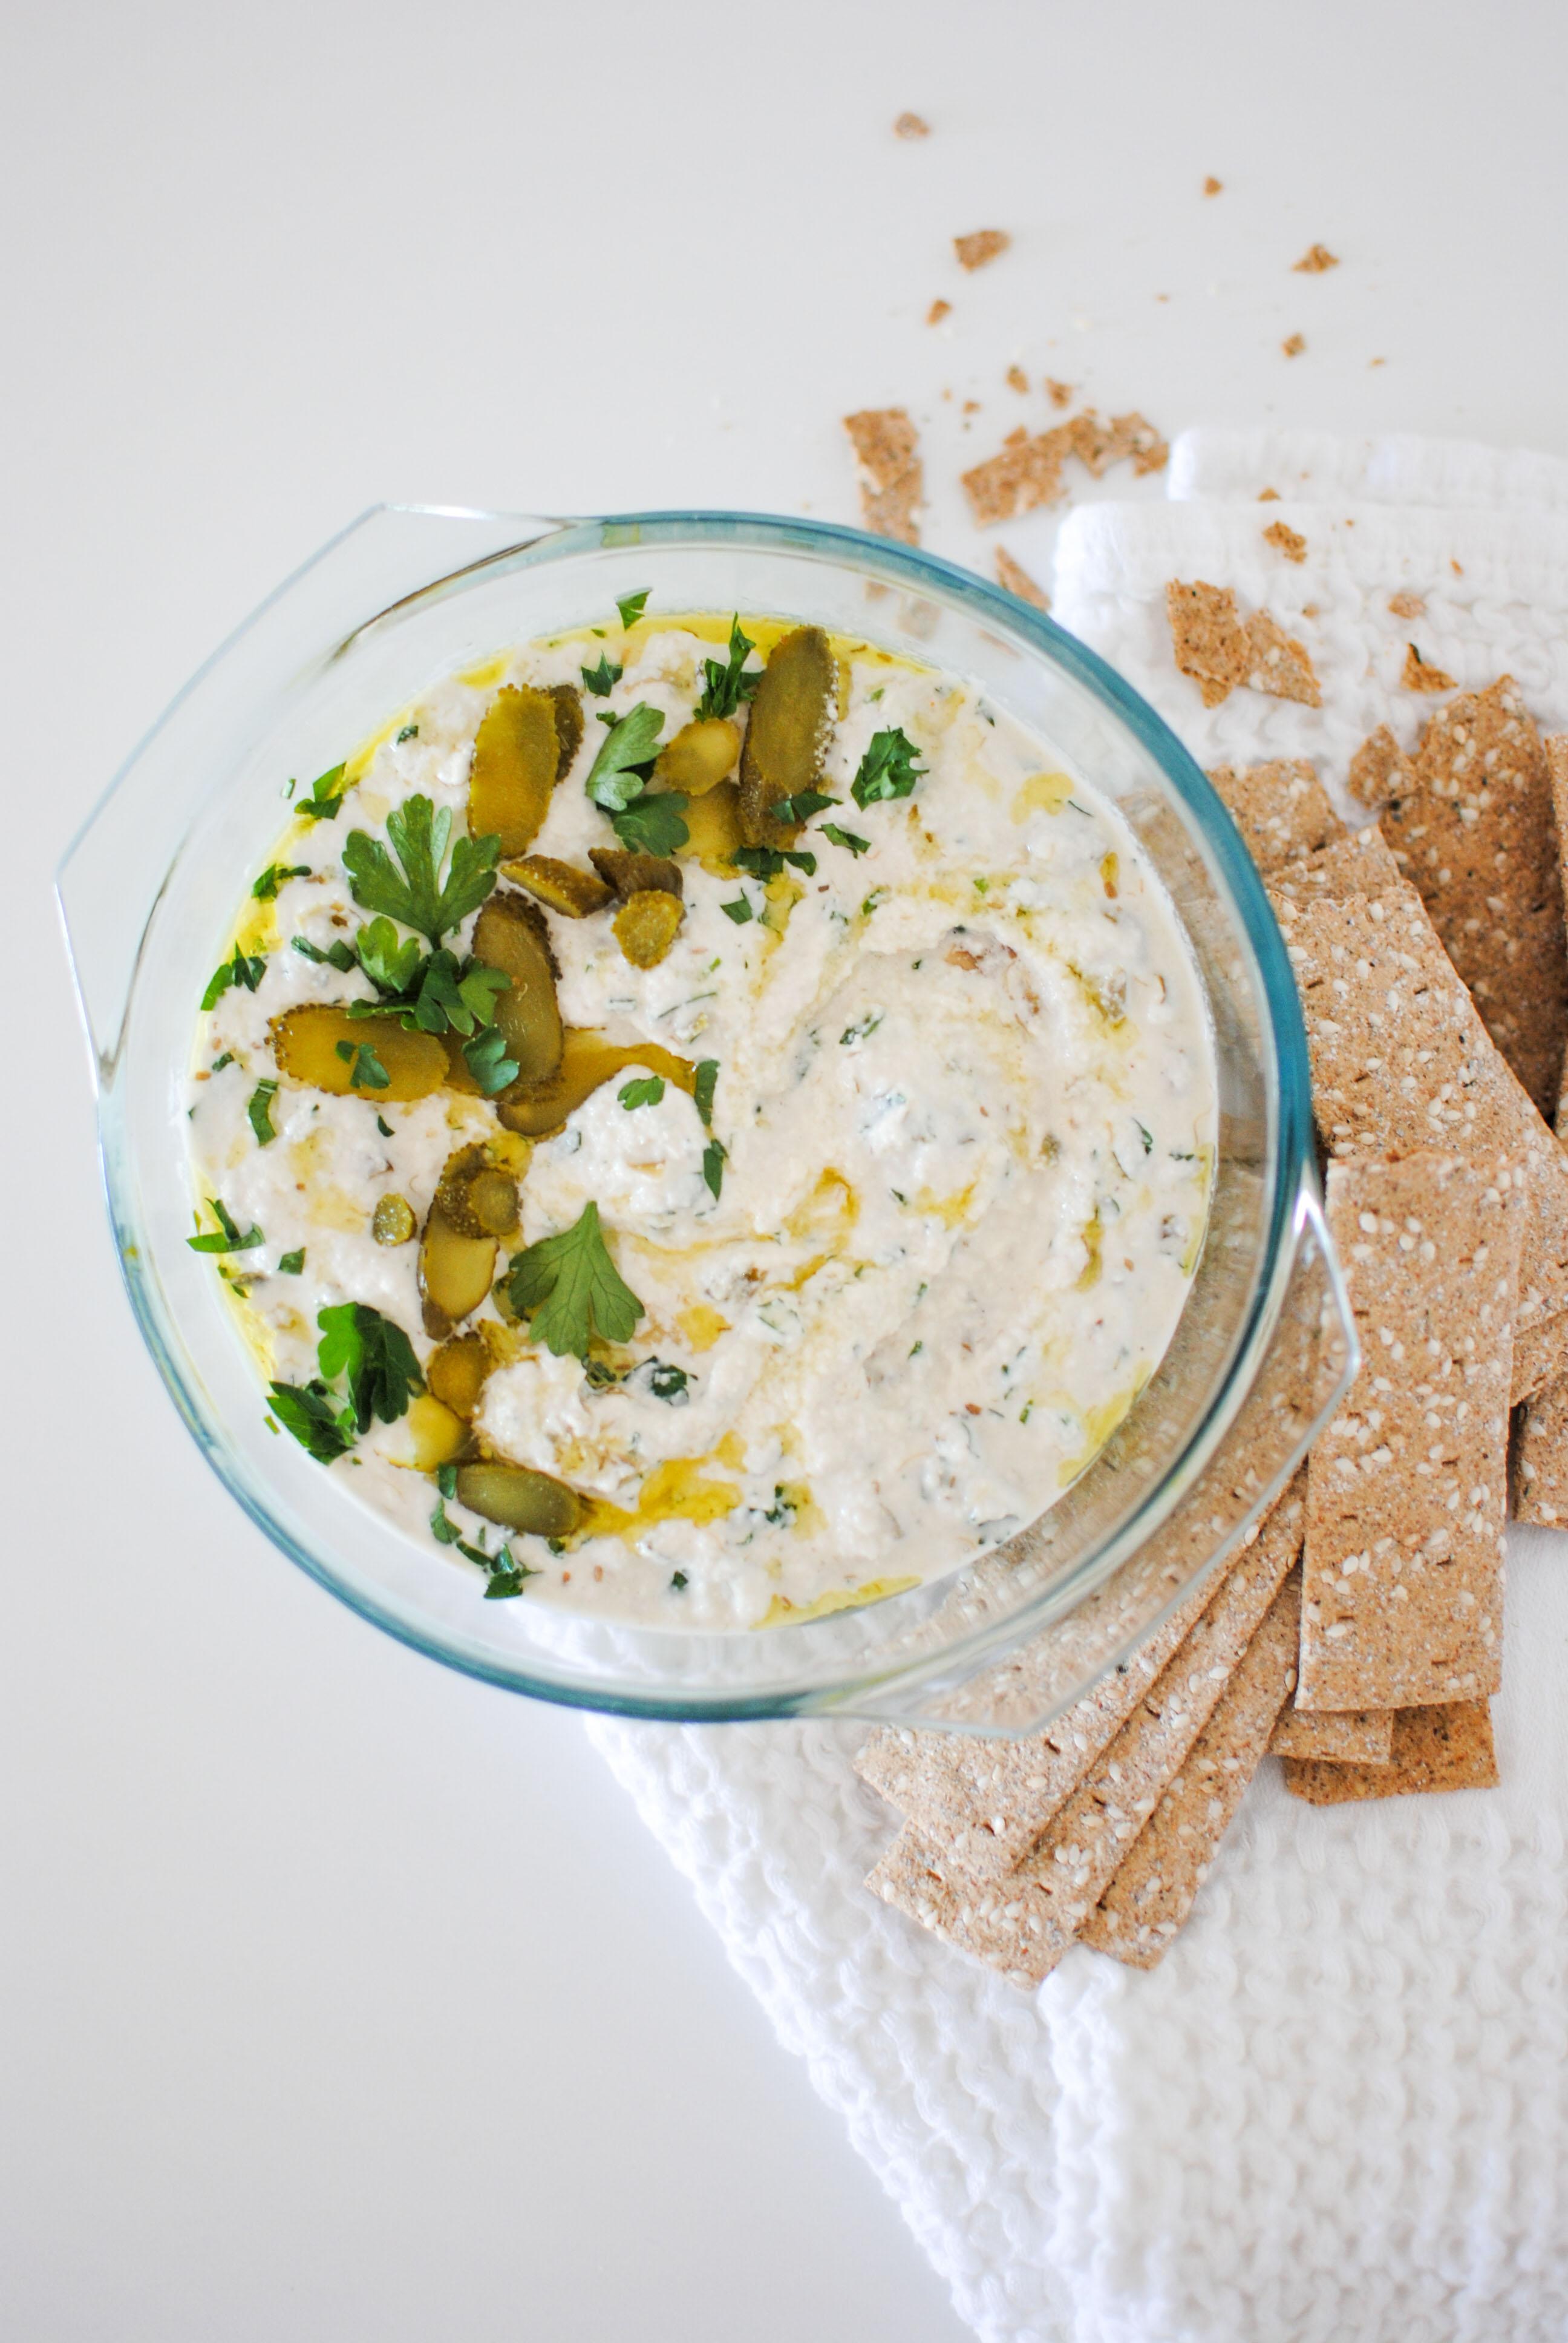 vegan tartar sauce | please consider | joana limao